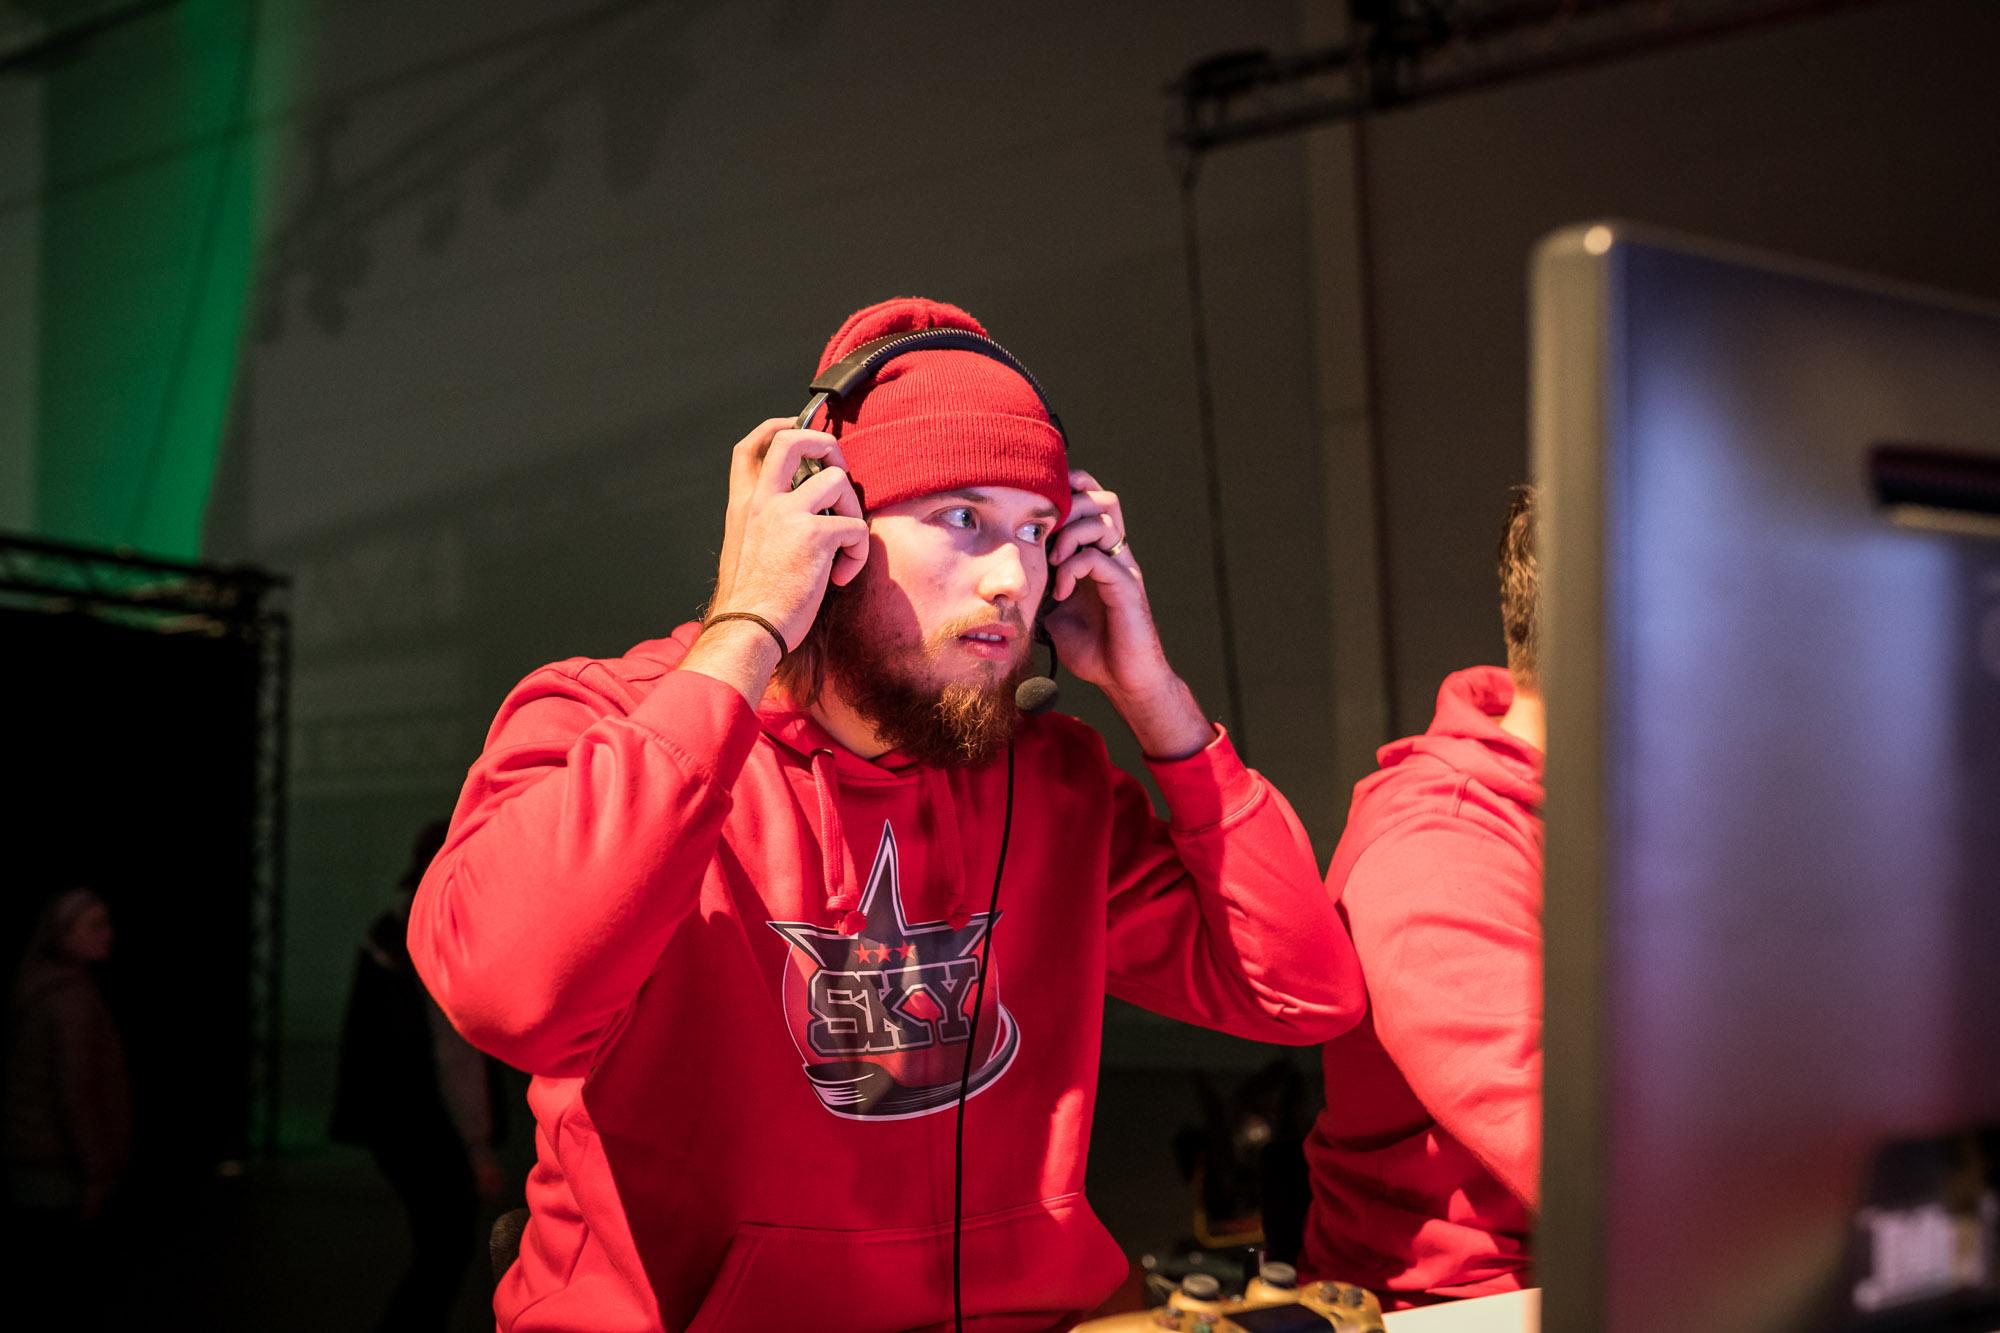 Jaaskelainen-NHLGamers-Gamexpo2018-1145.